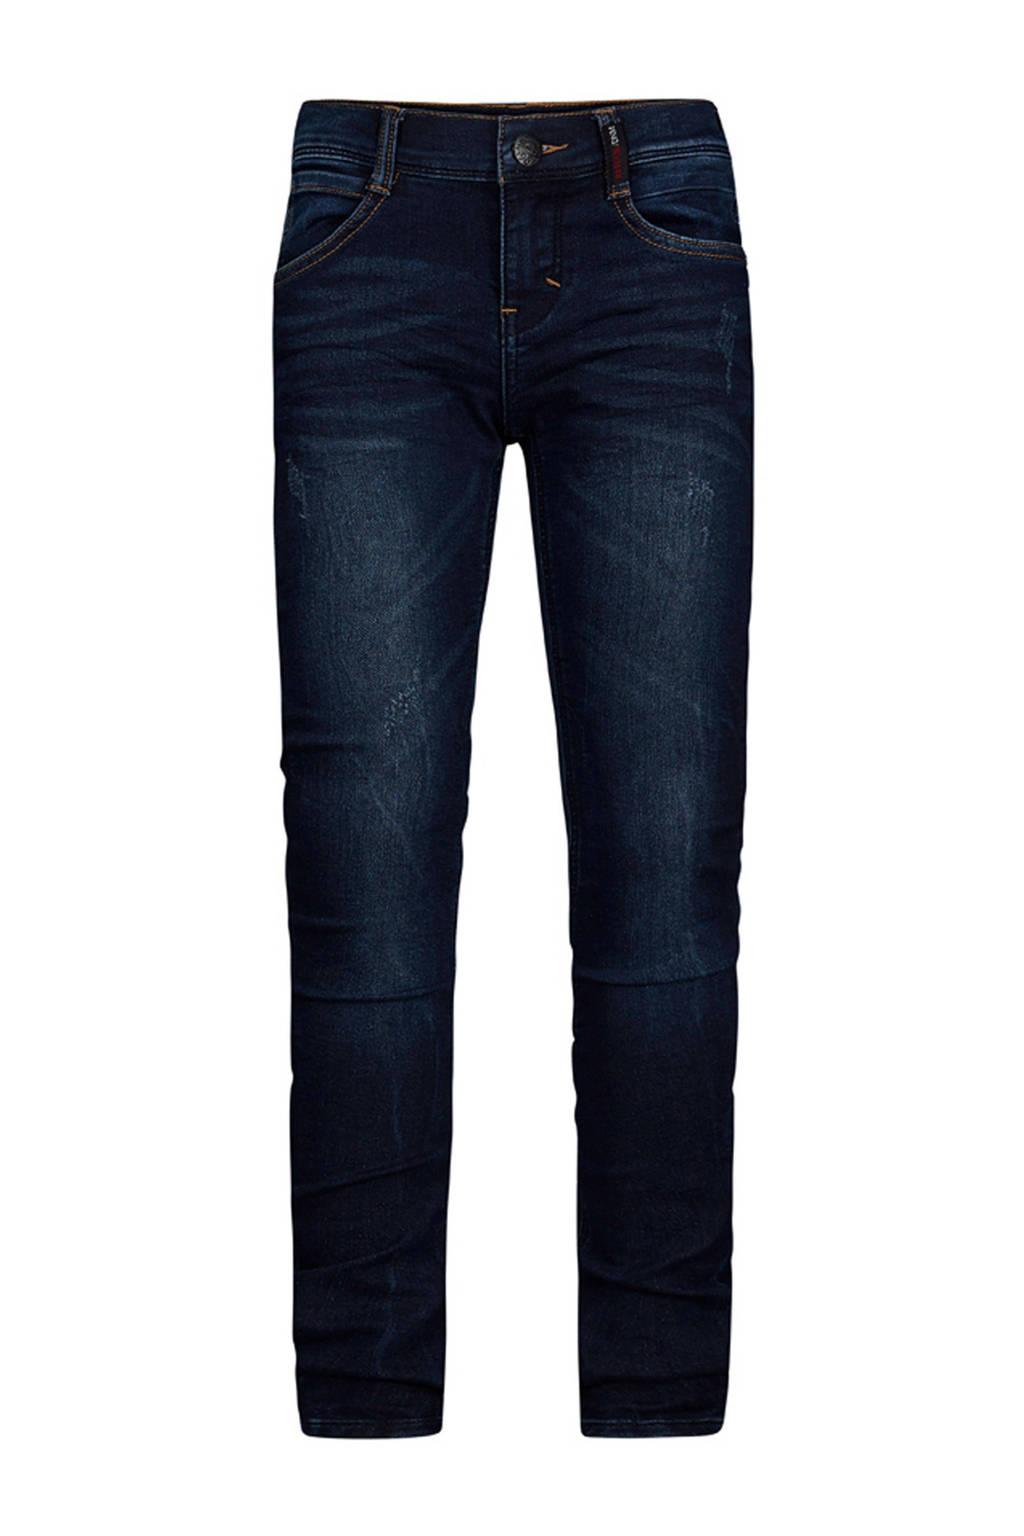 Retour Denim slim fit jeans Luigi donkerblauw, Donkerblauw